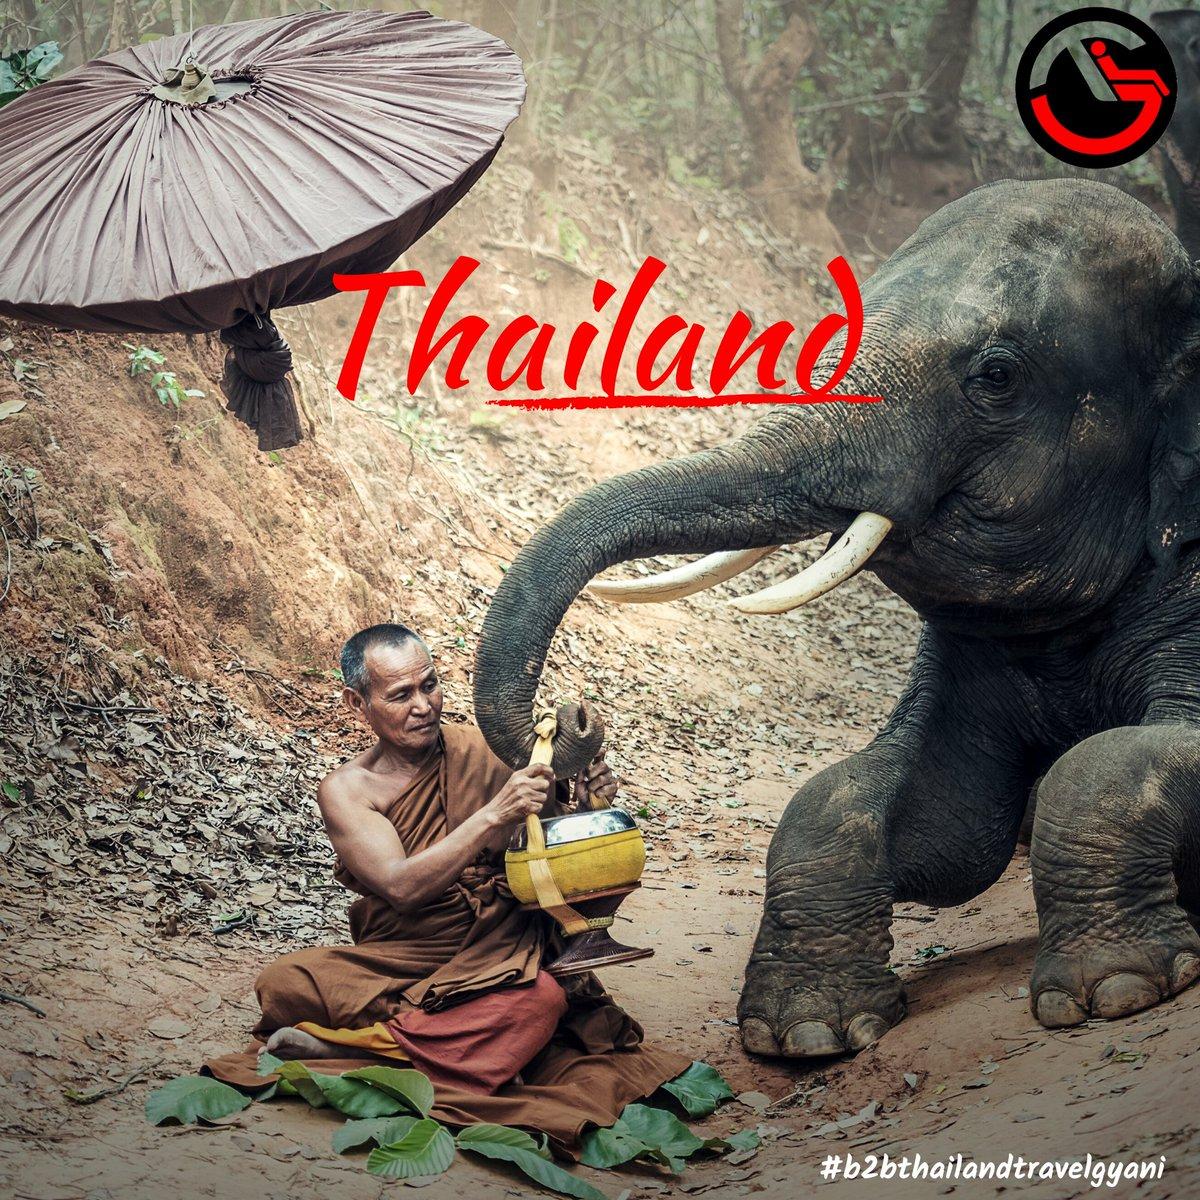 TheThai elephant(Thai: ช้างไทย, changThai) is the official national animal ofThailand. n estimated 100,000 domesticated or captiveelephantsinThailand. #thailandtourismboard #thailandbeach #thailandtourism #thaielephant #thaielephanthome #thaielephants #elephants  #tgpic.twitter.com/JgyUJyhipn